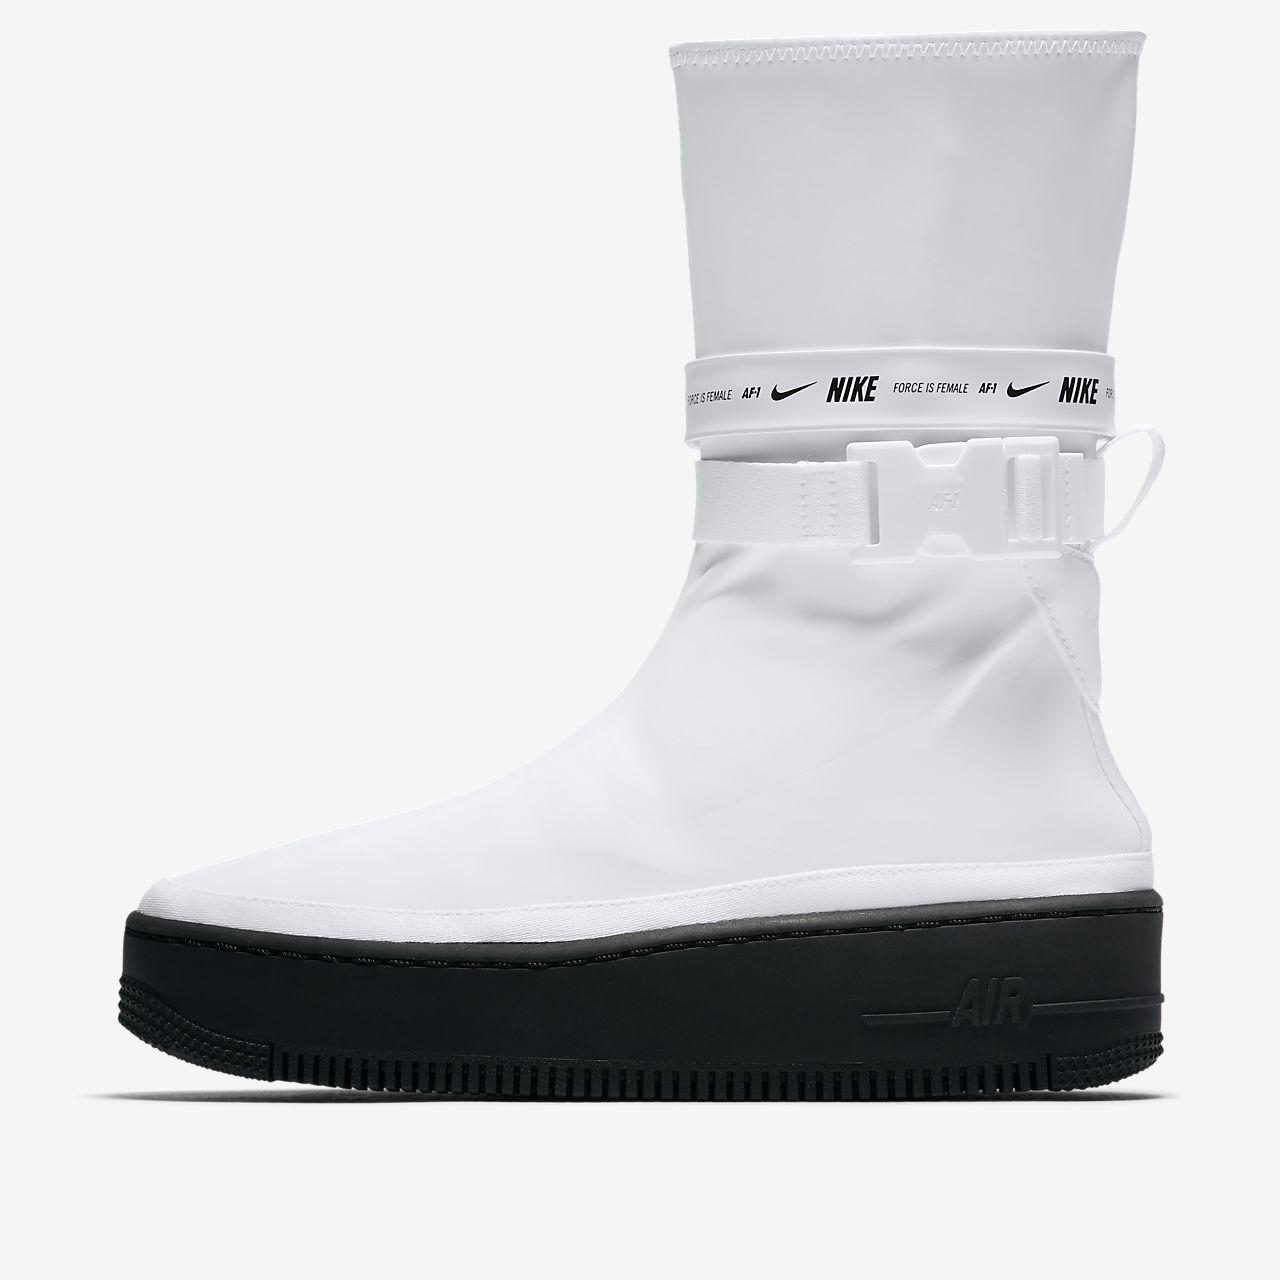 Sko Nike Air Force 1 Sage High för kvinnor